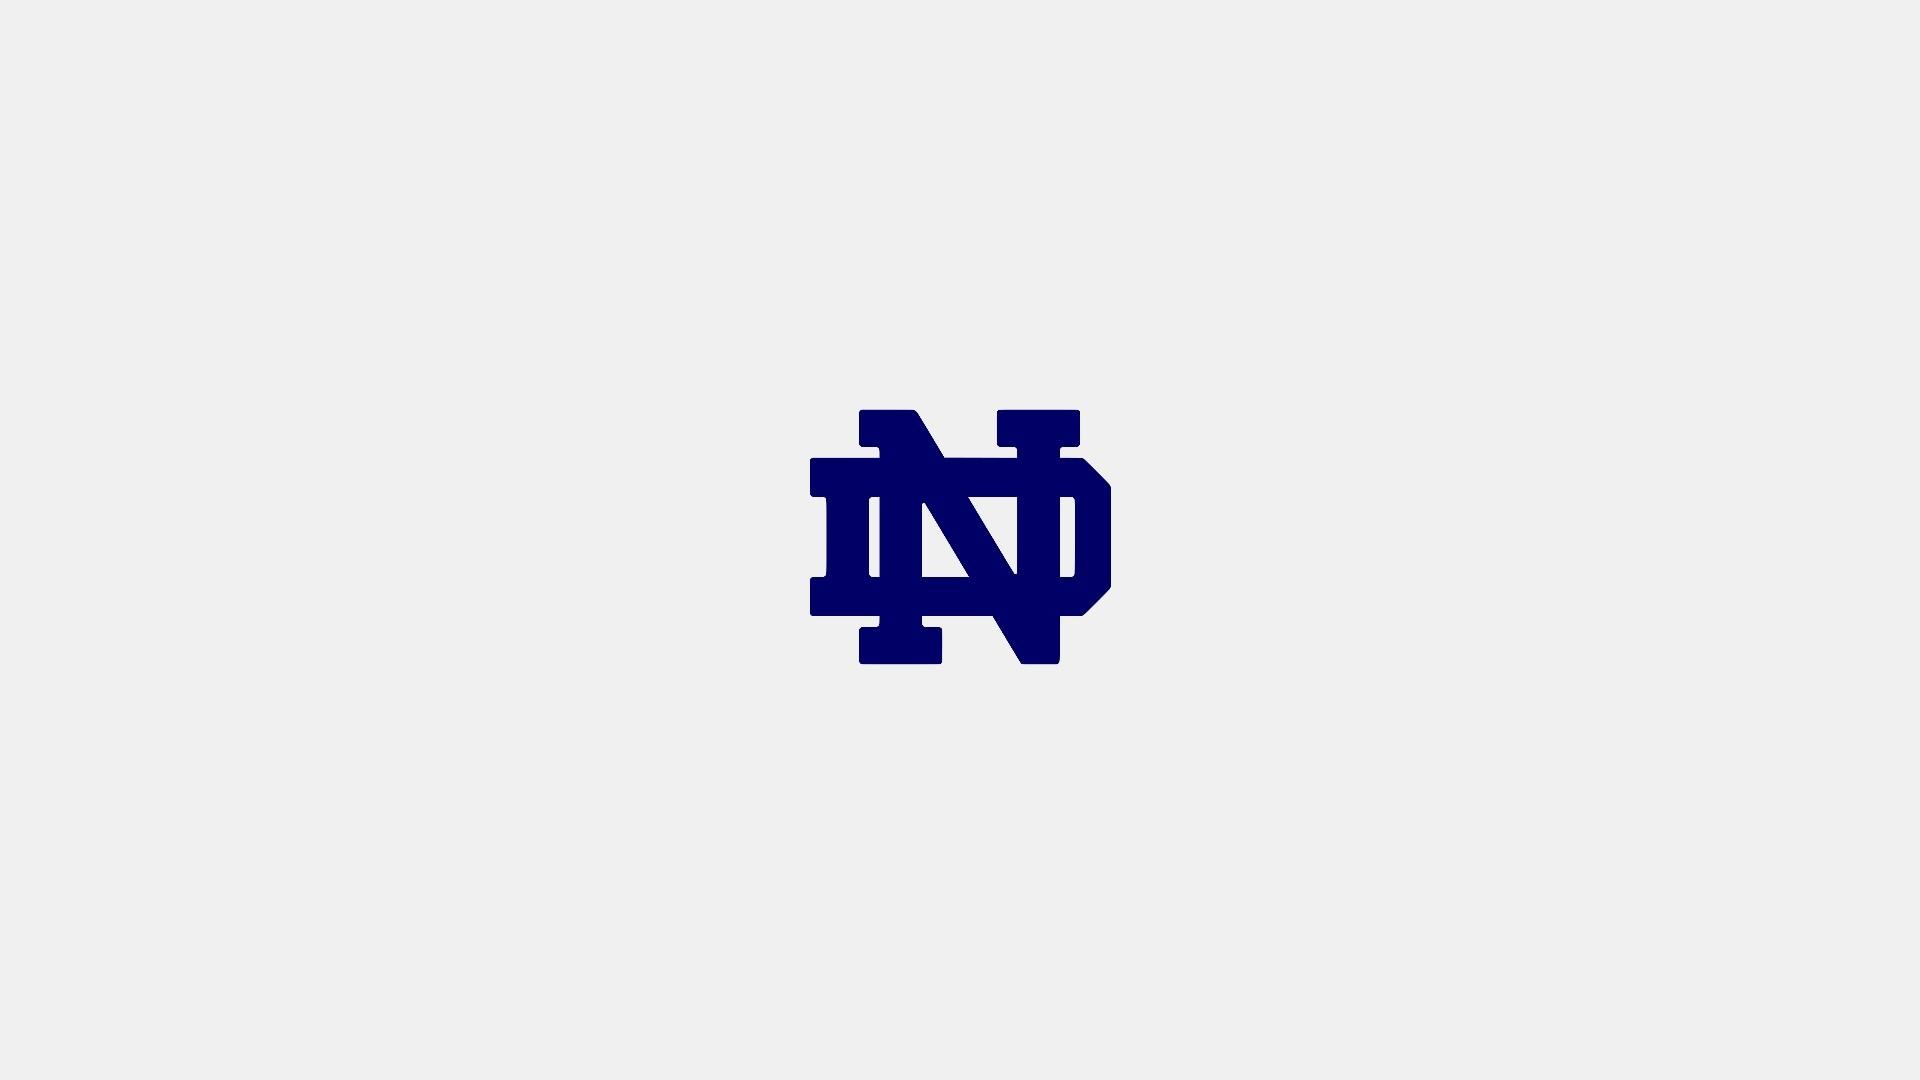 Notre Dame Fighting Irish Wallpapers ·①